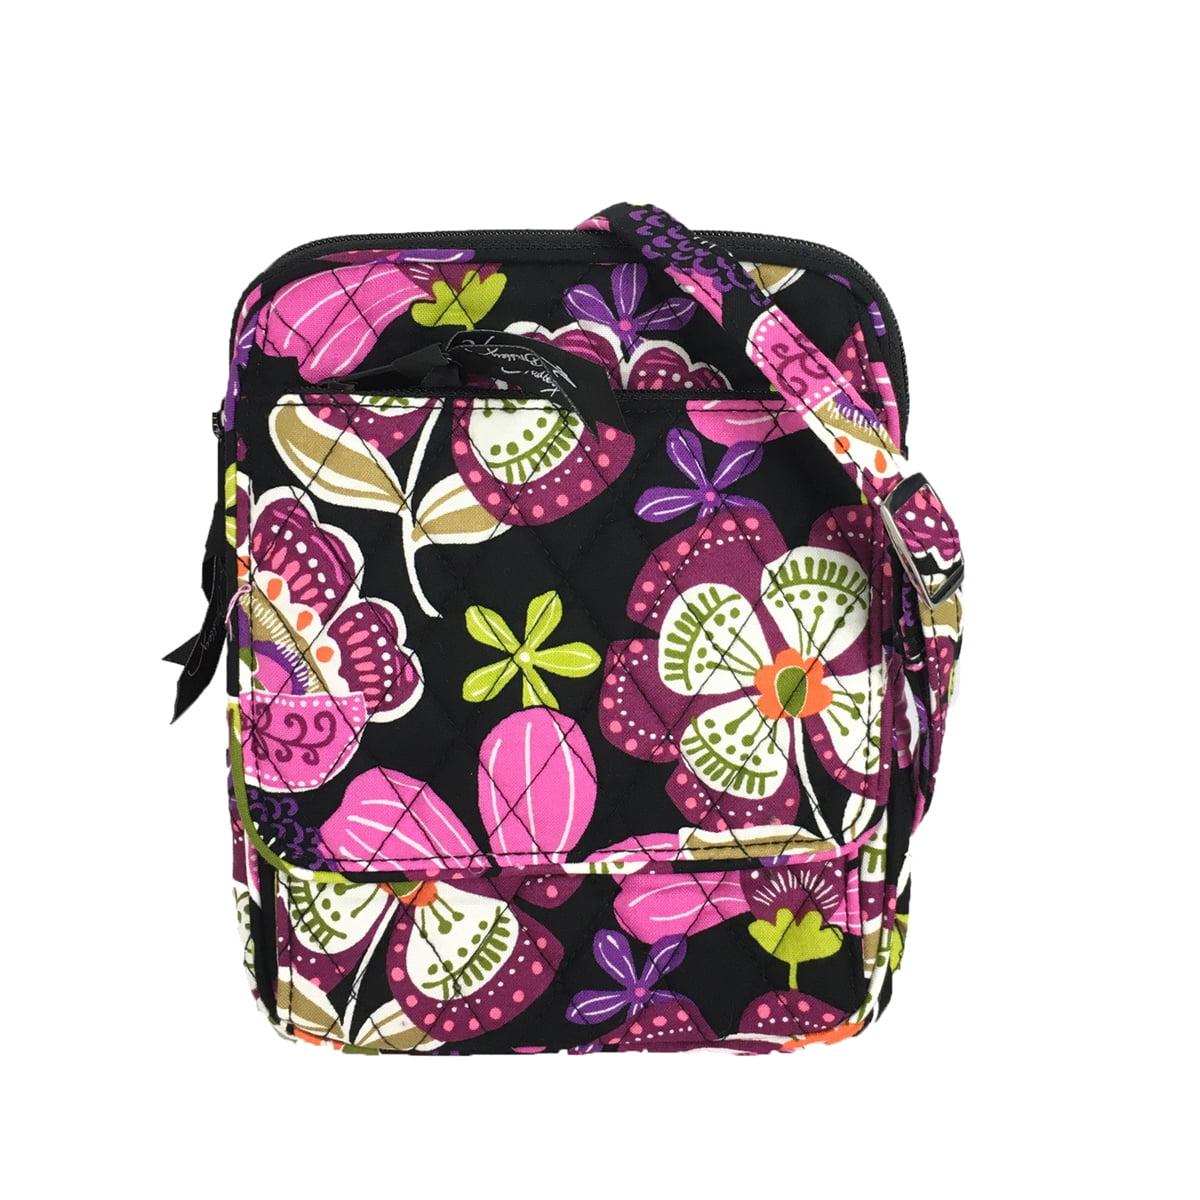 Vera Bradley Mini Hipster Crossbody Bag, Pirouette Pink